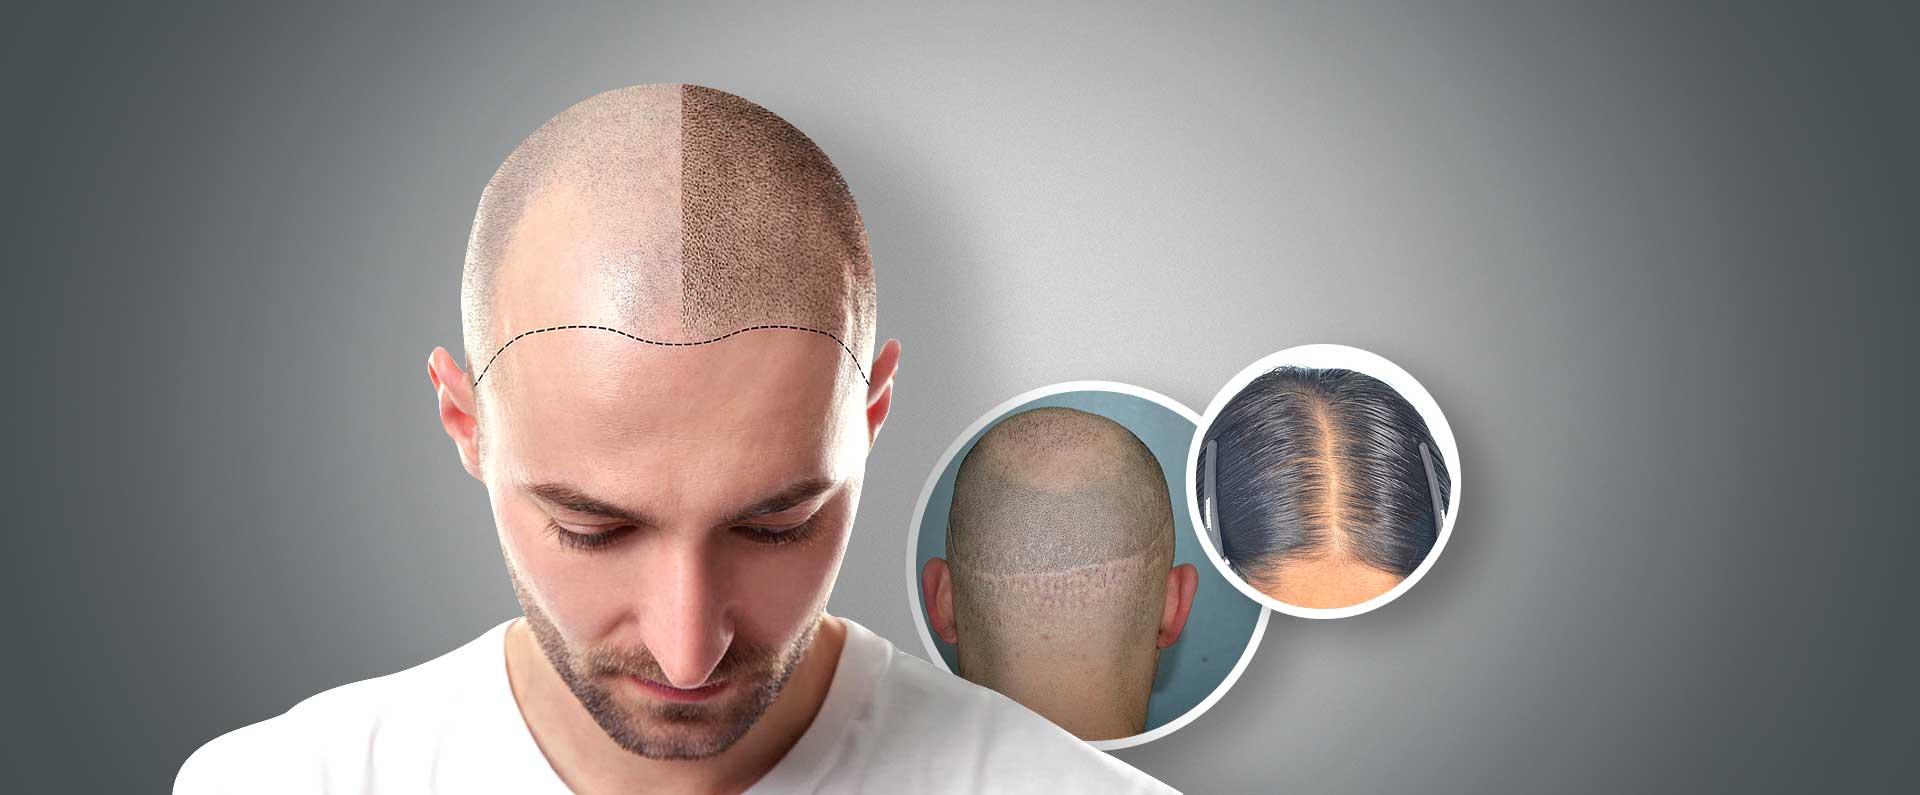 Scalp Micropigmentation India Hair Loss Treatment Clinic